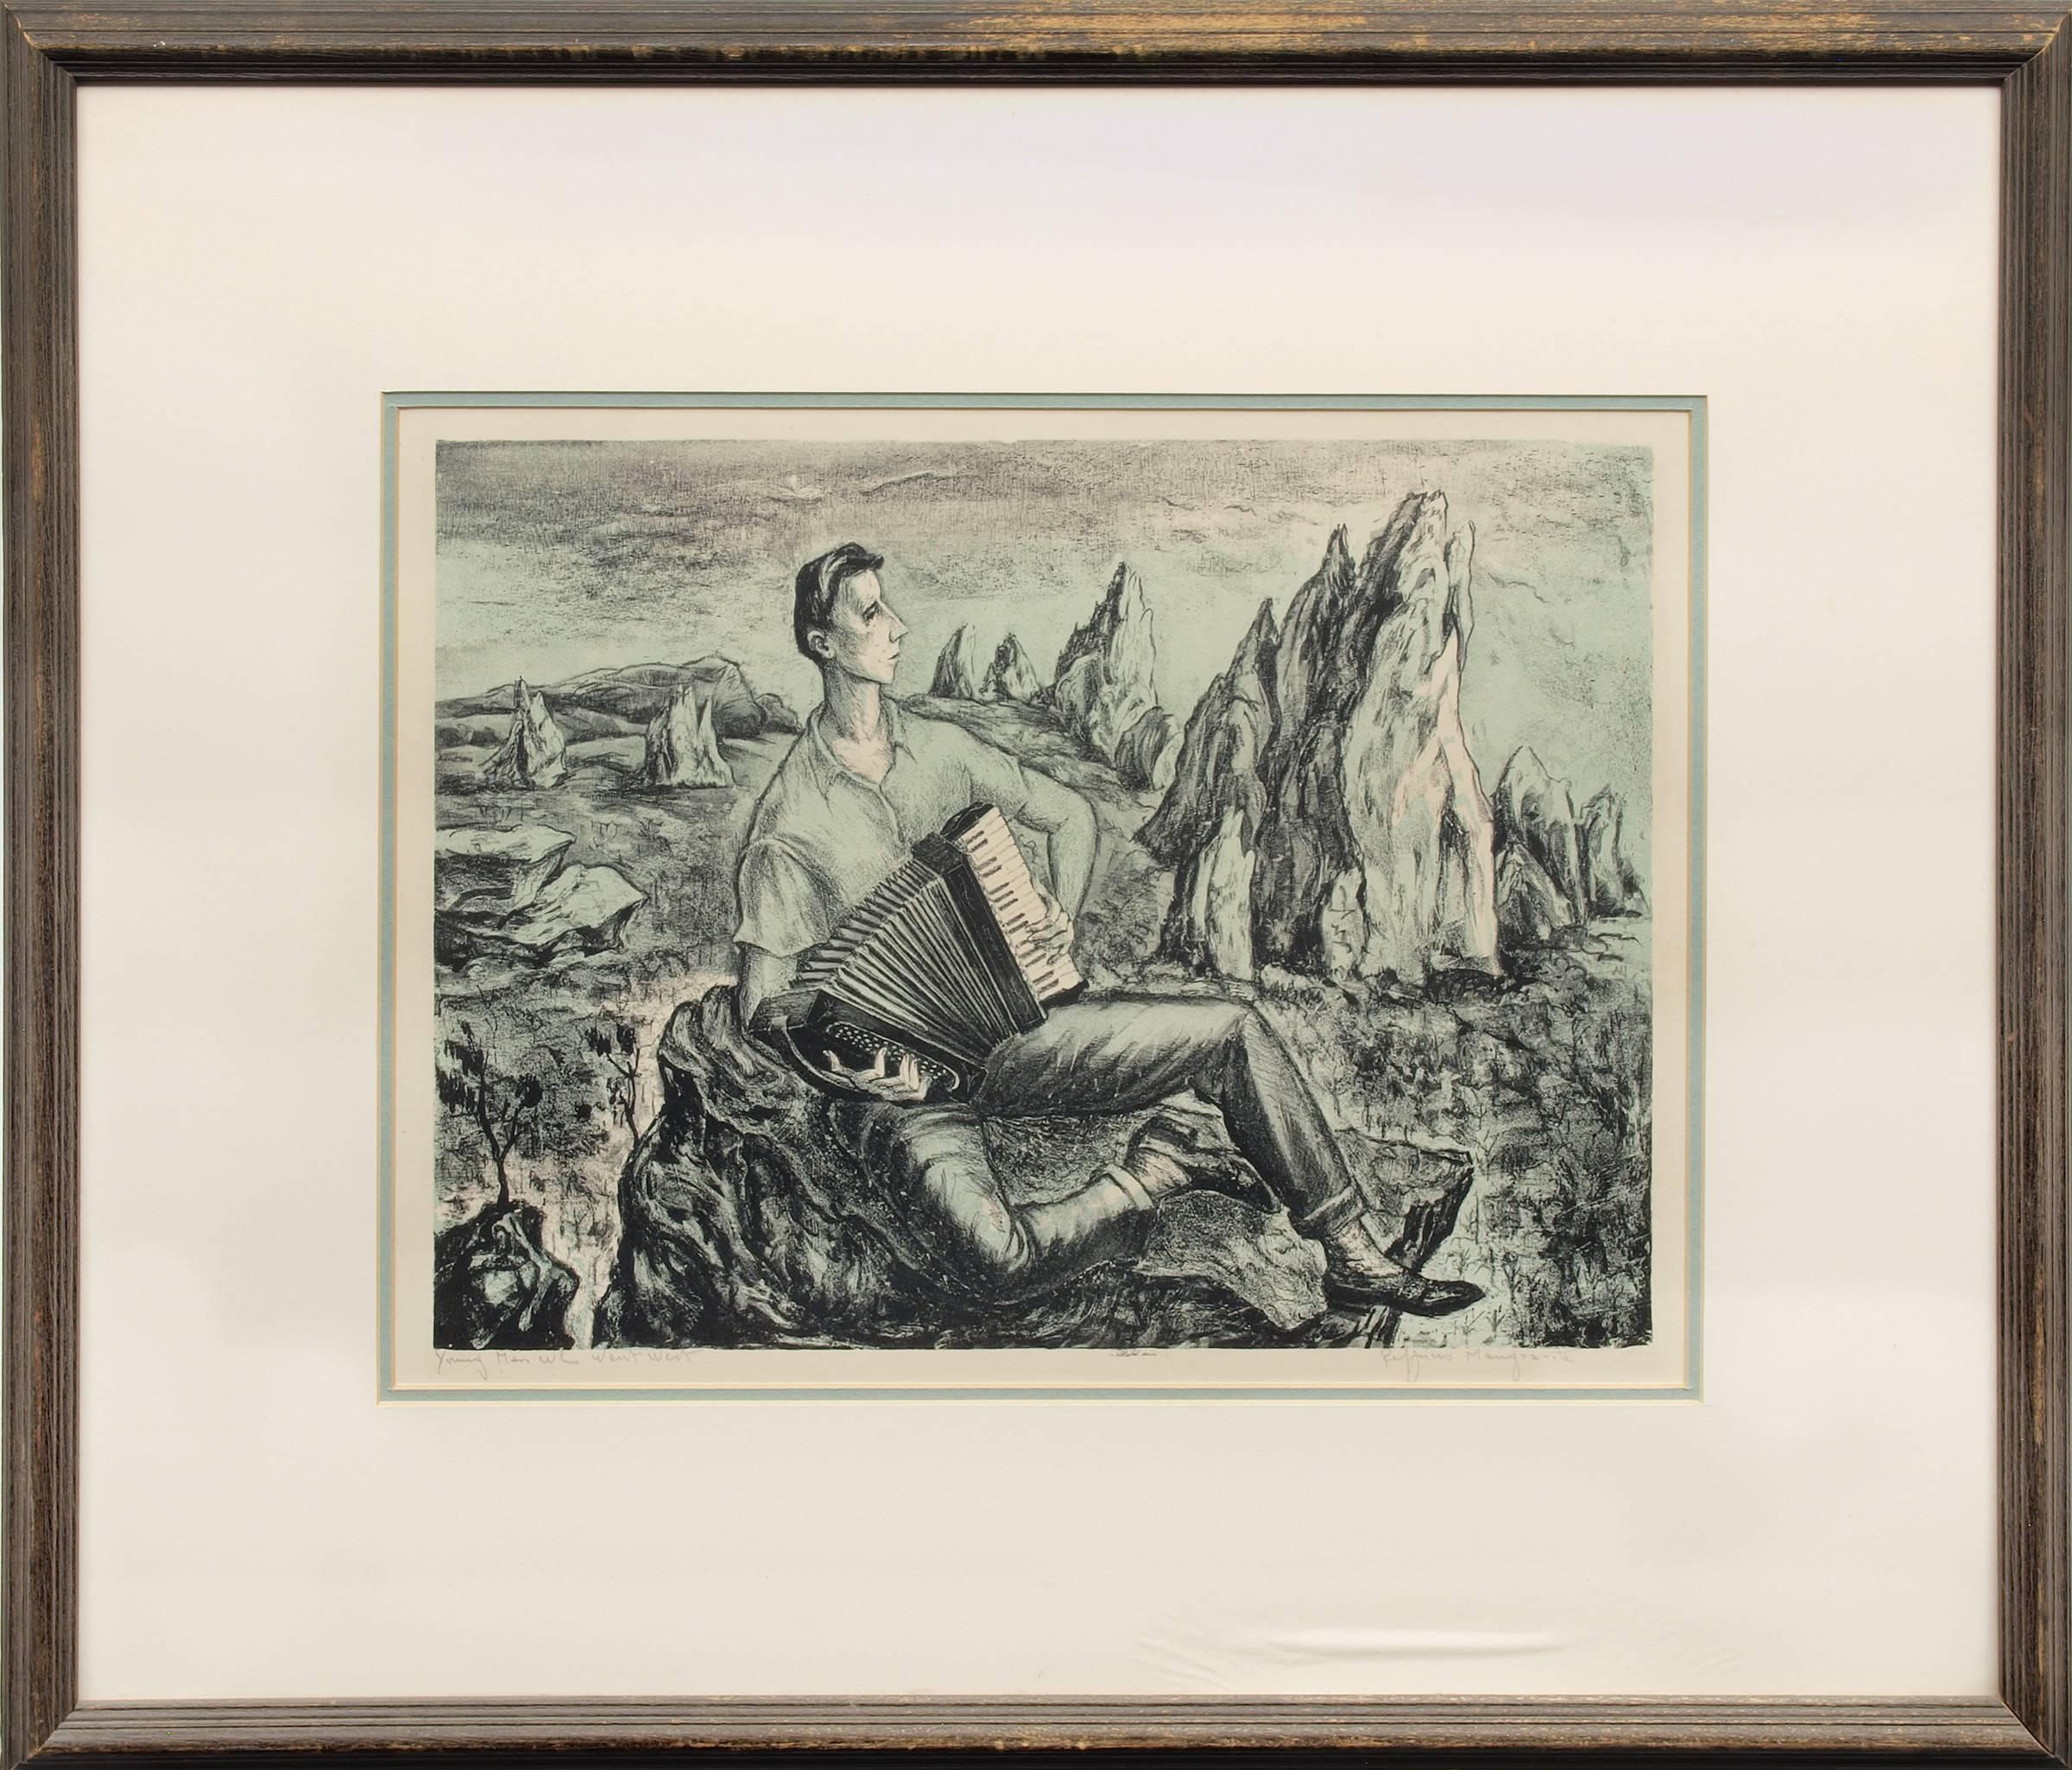 Young Man Who Went West WPA Era Modernist Colorado Landscape, Black, Blue, White